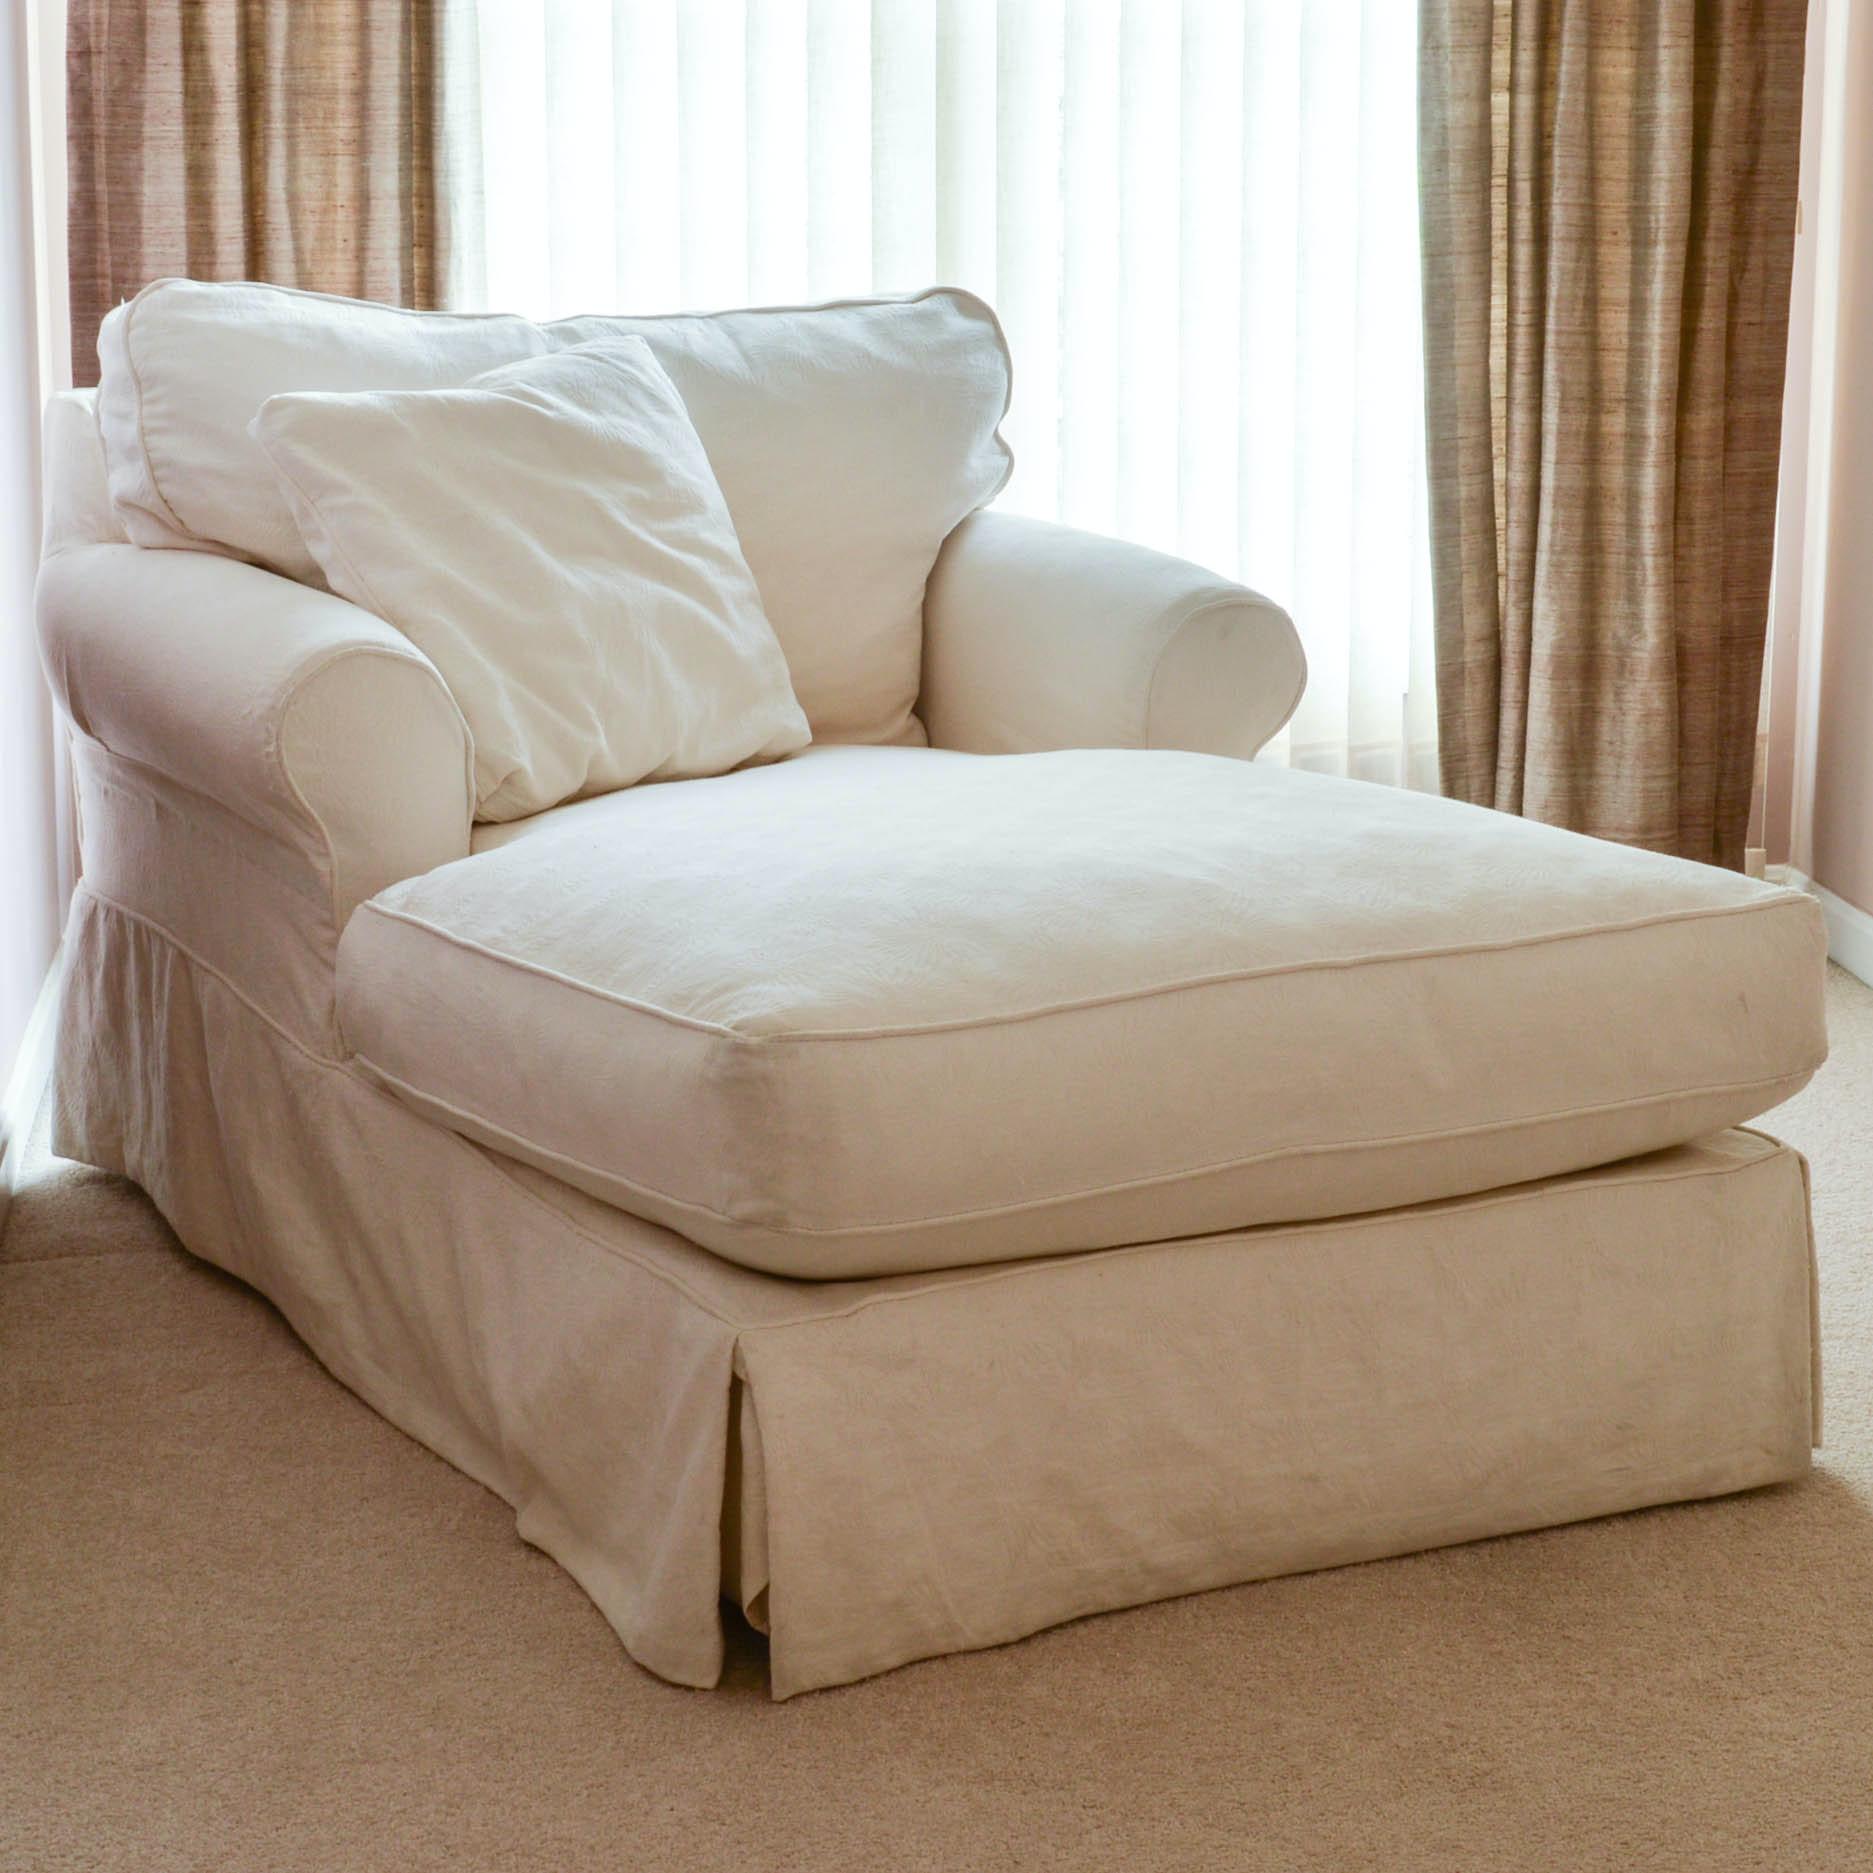 Arhaus Furniture Chaise Lounge ...